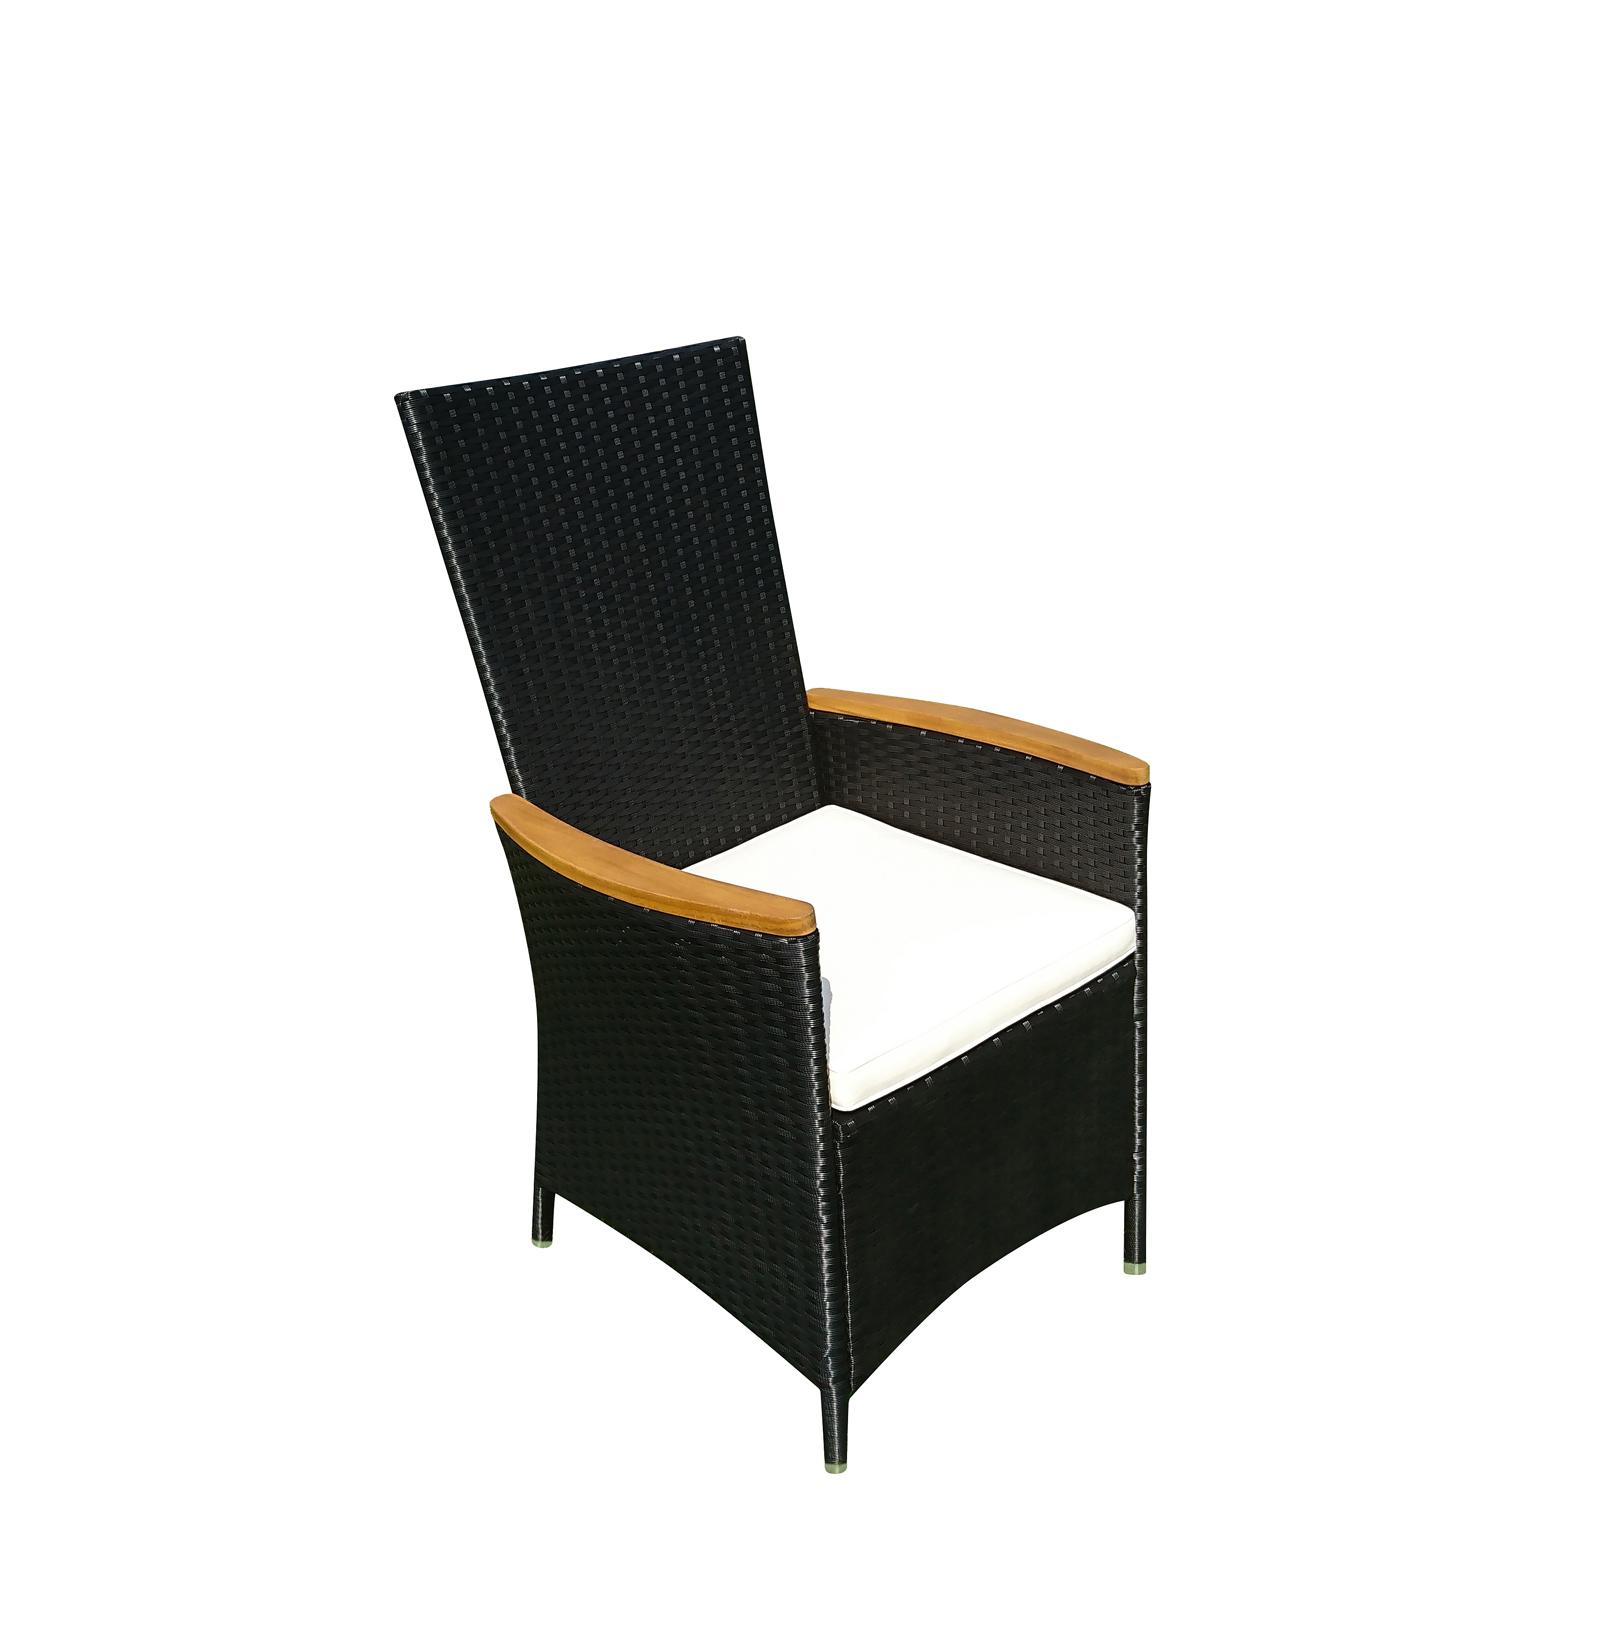 sam sessel gartensessel verstellbar polyrattan fsc finn. Black Bedroom Furniture Sets. Home Design Ideas